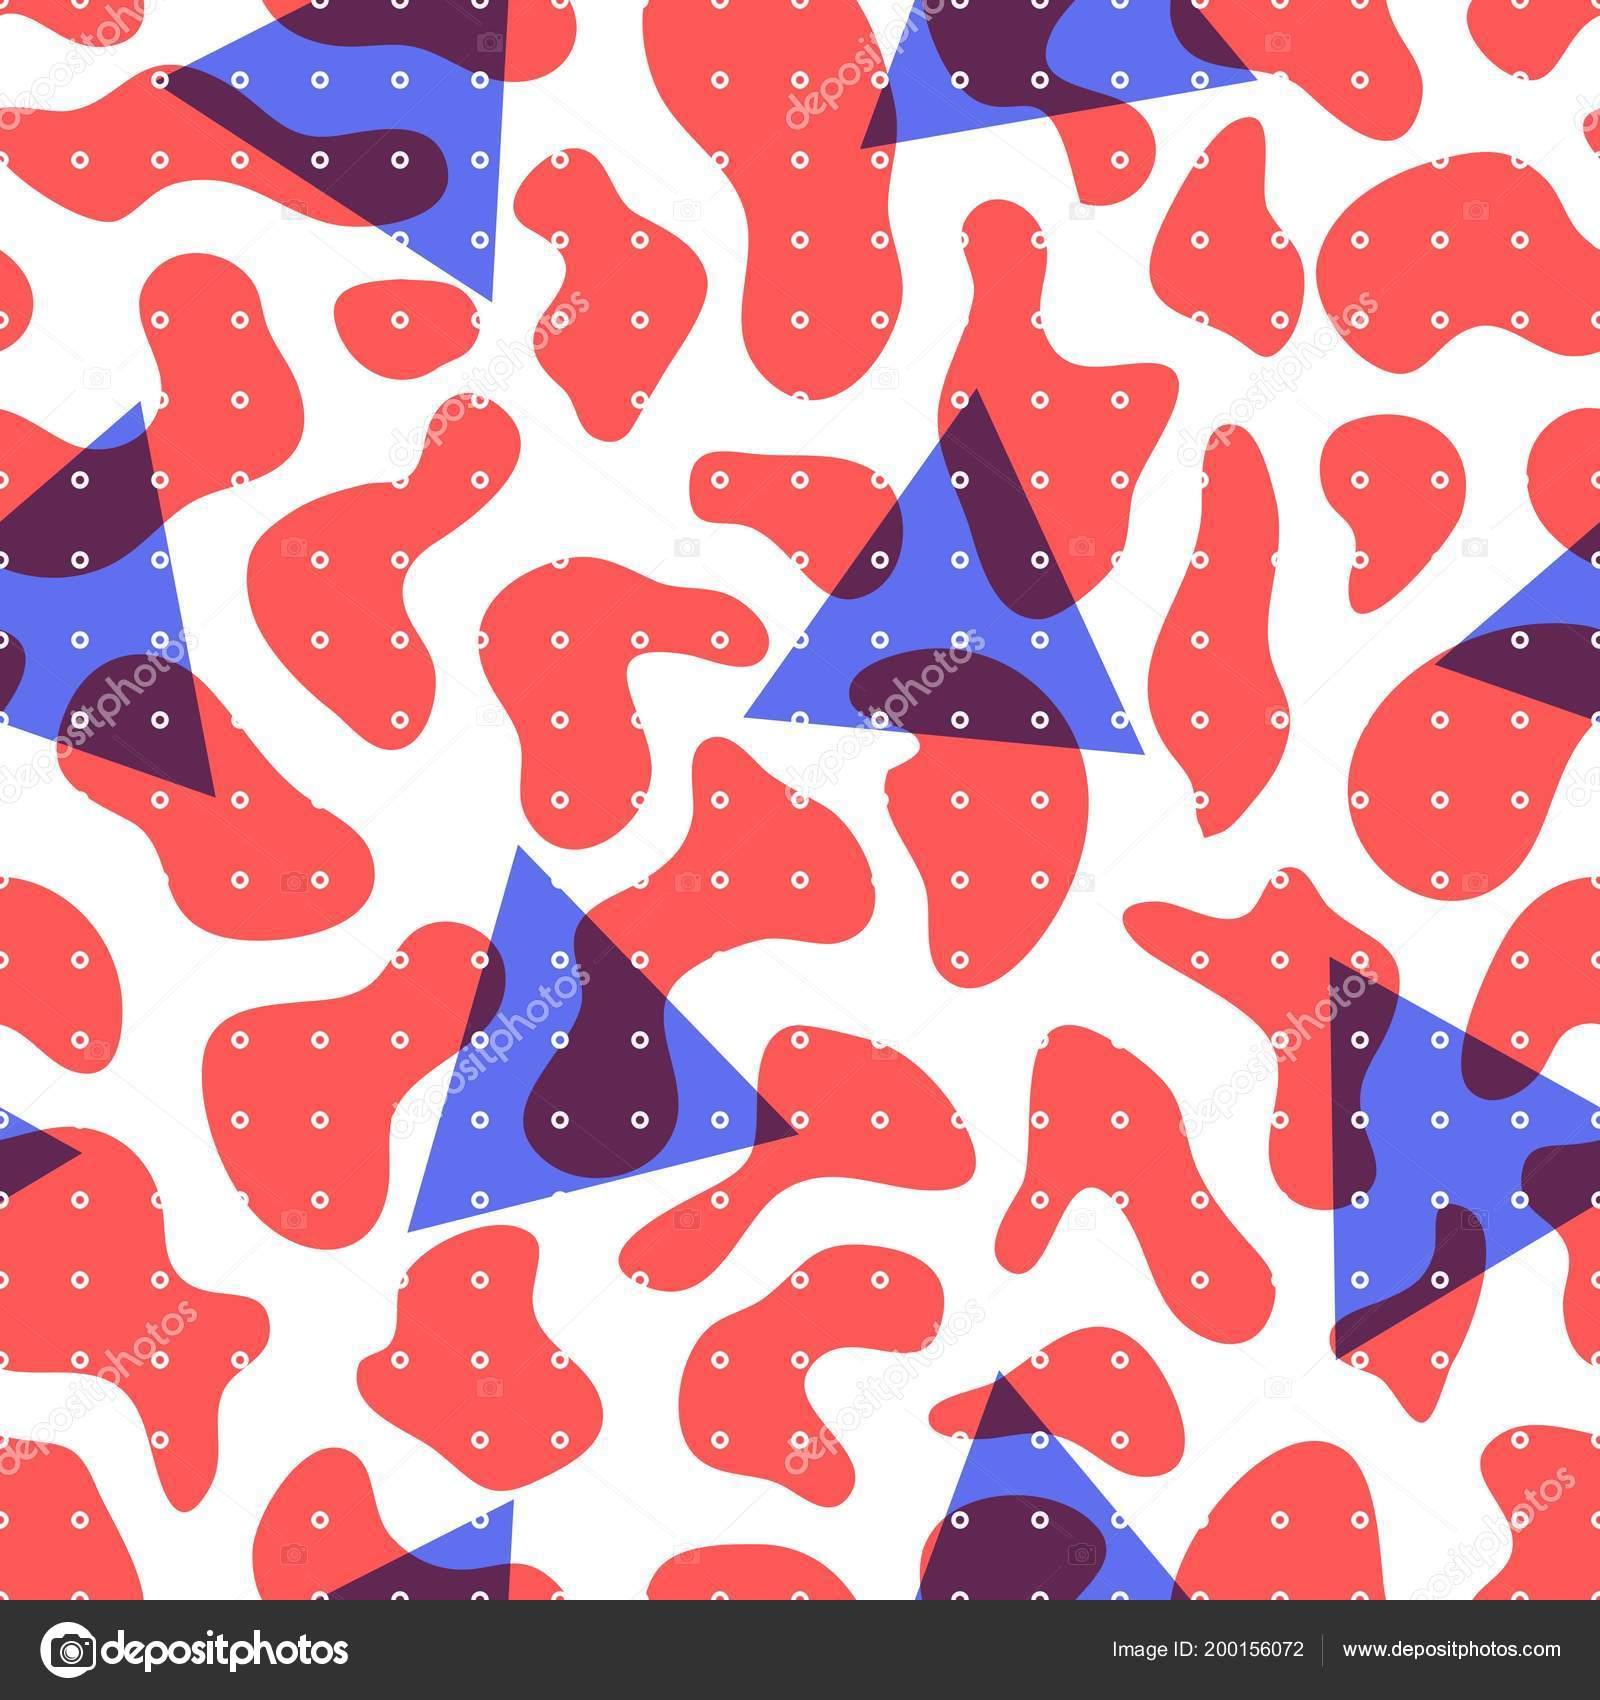 Retro Seamless Pattern In Minimalist Style Geometric Vector Background Design